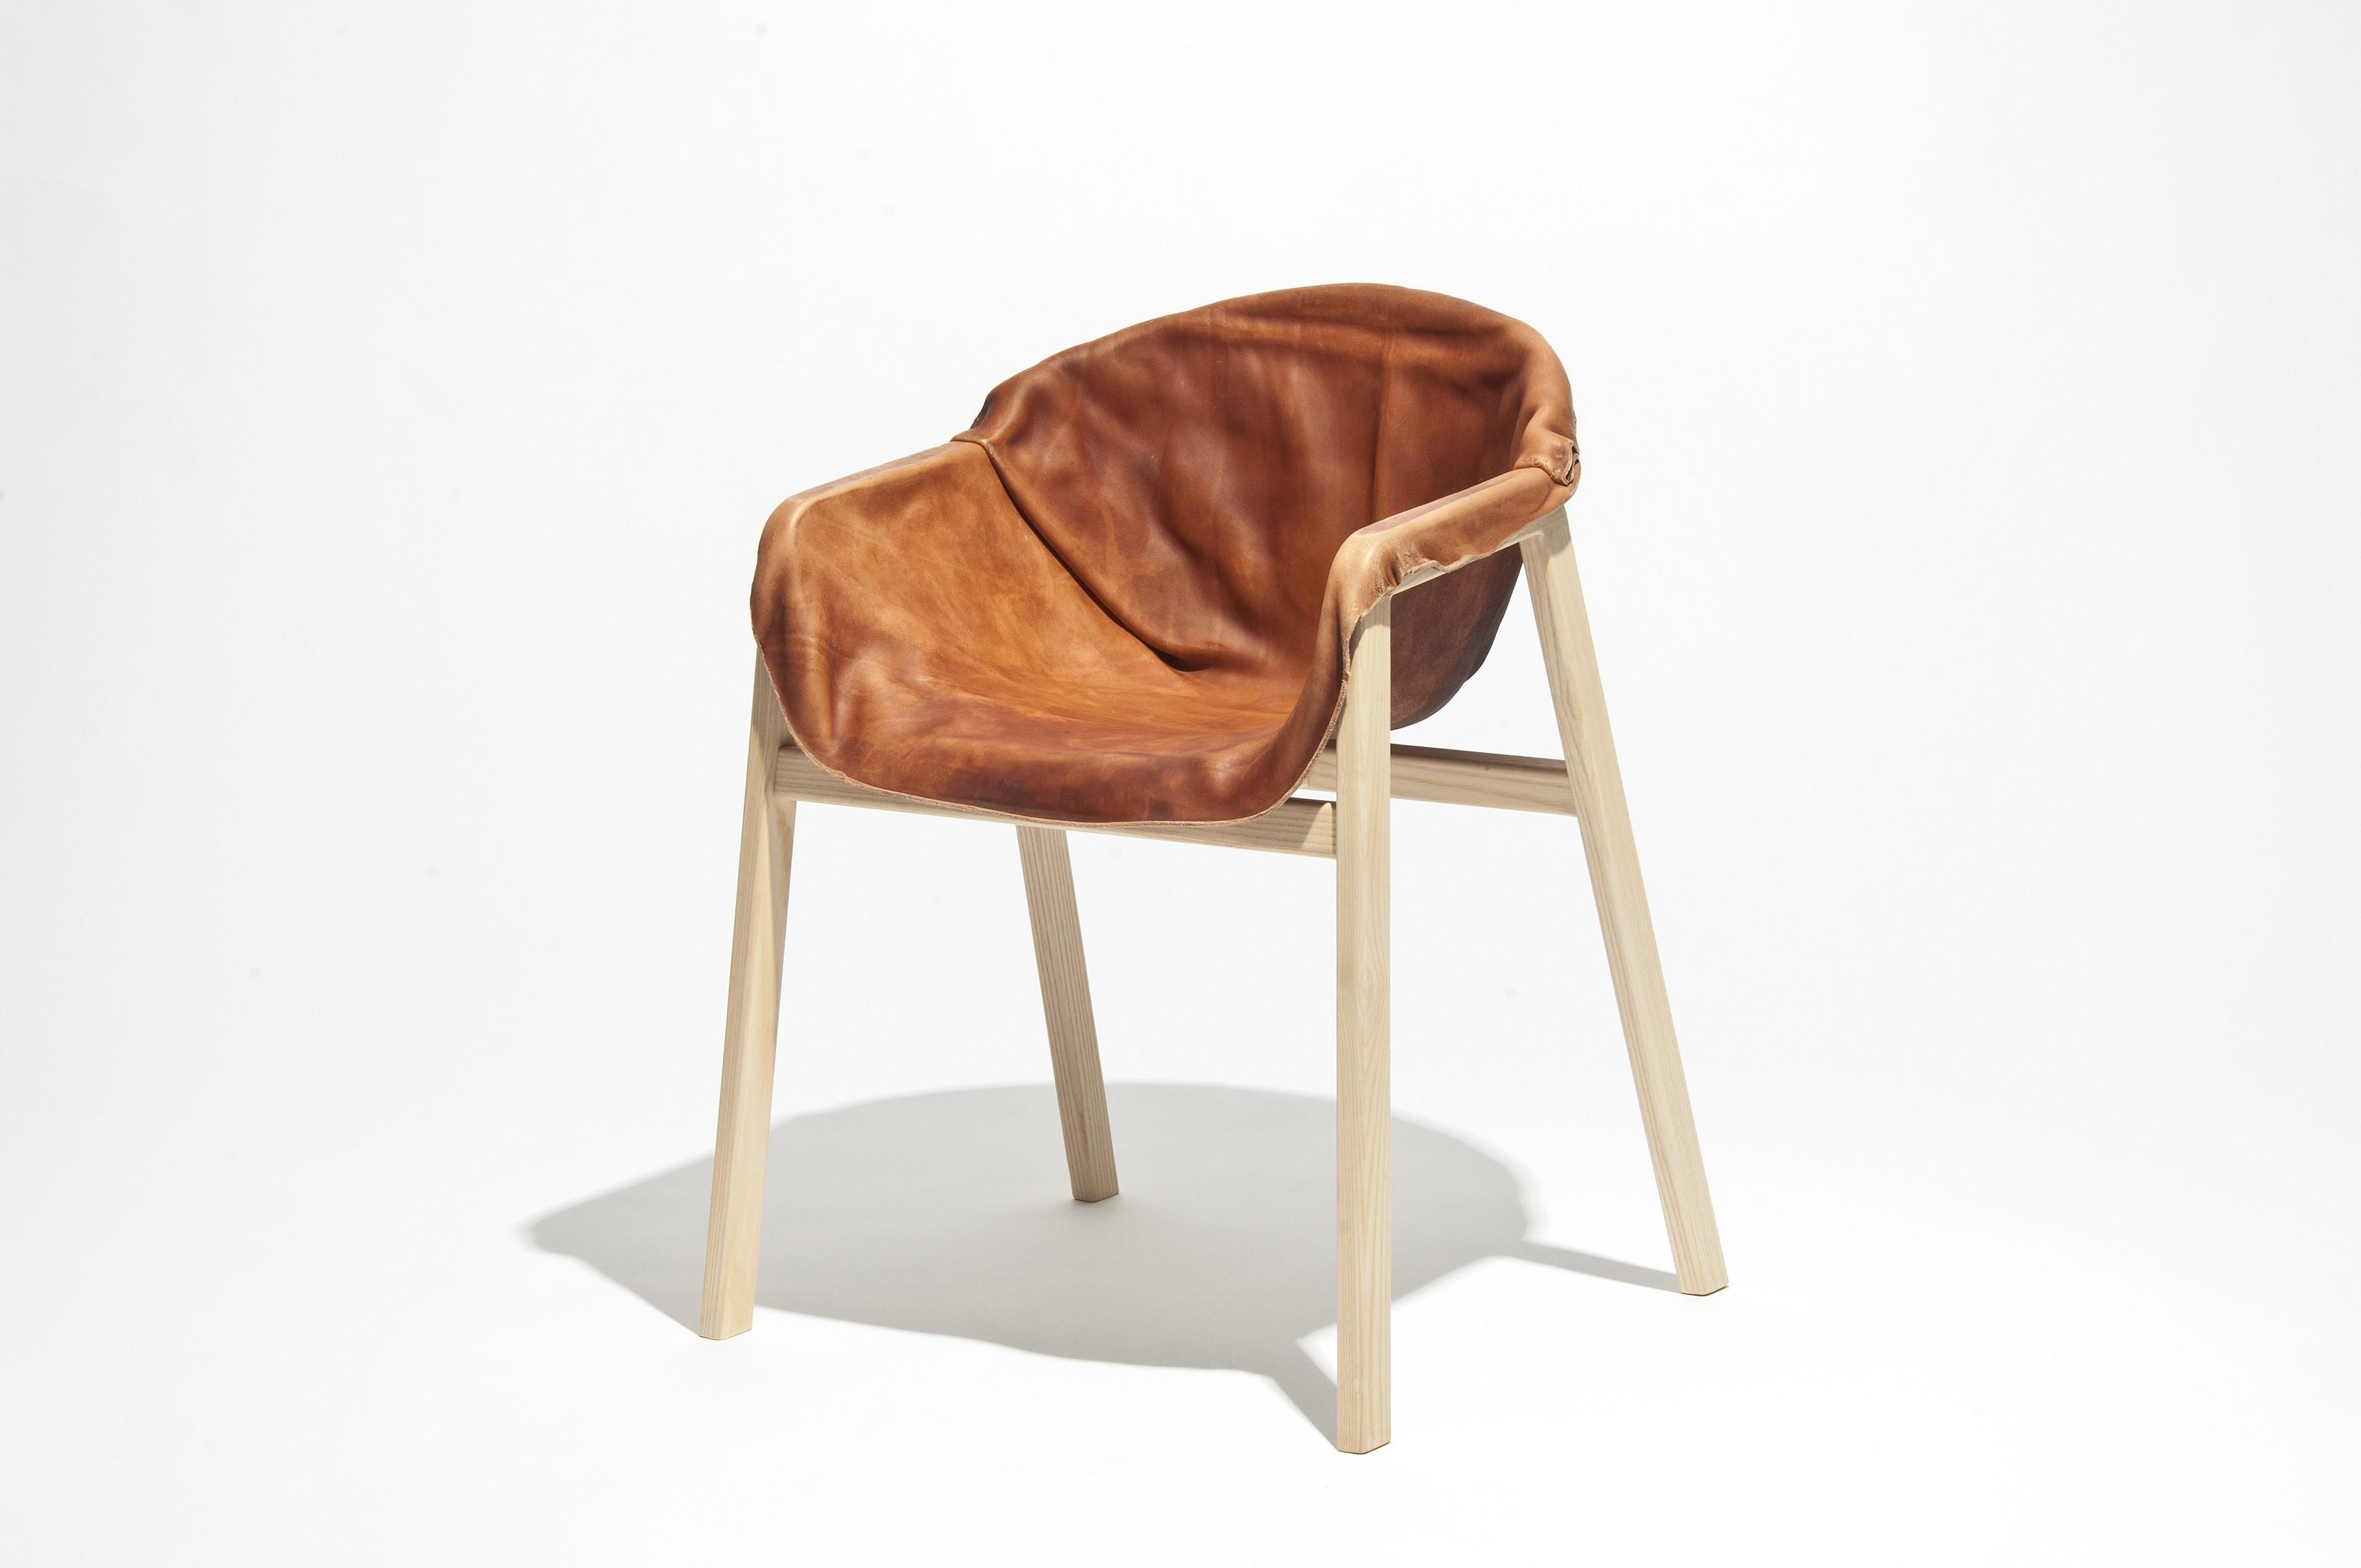 Green Furniture Award Sustainable Design Youn